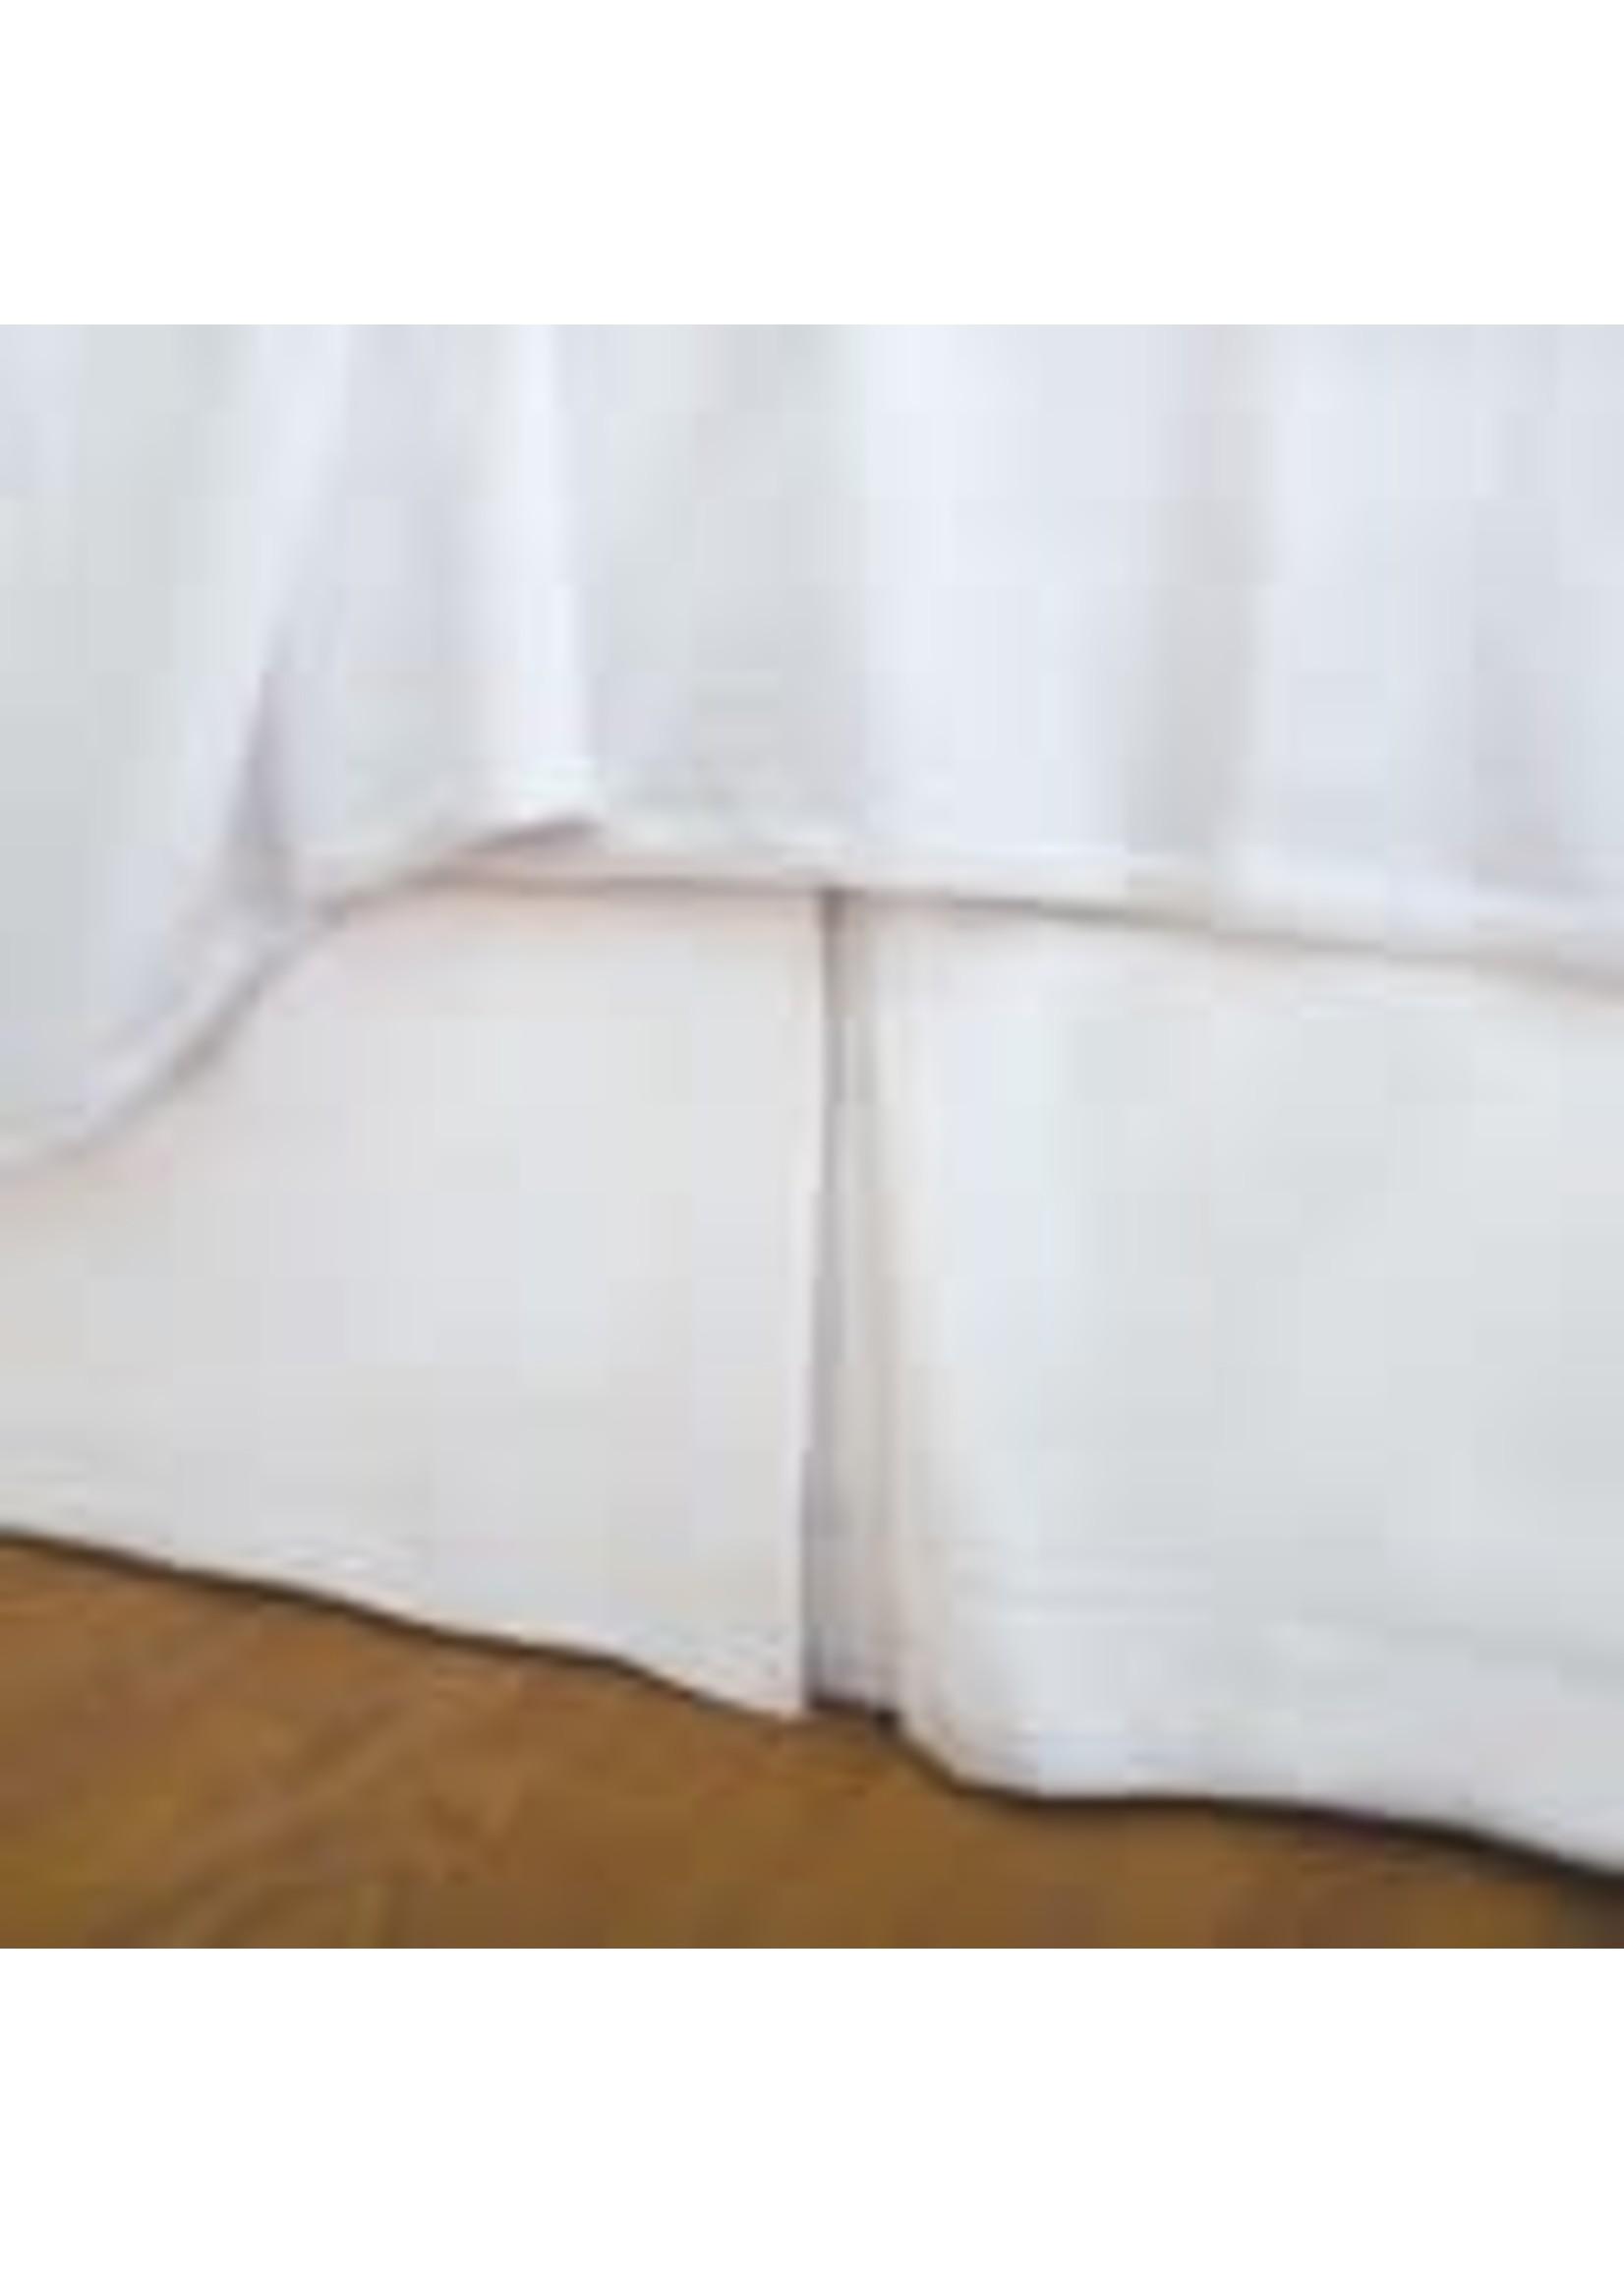 TWIN, HEMSTITCH WHITE BEDSKIRT